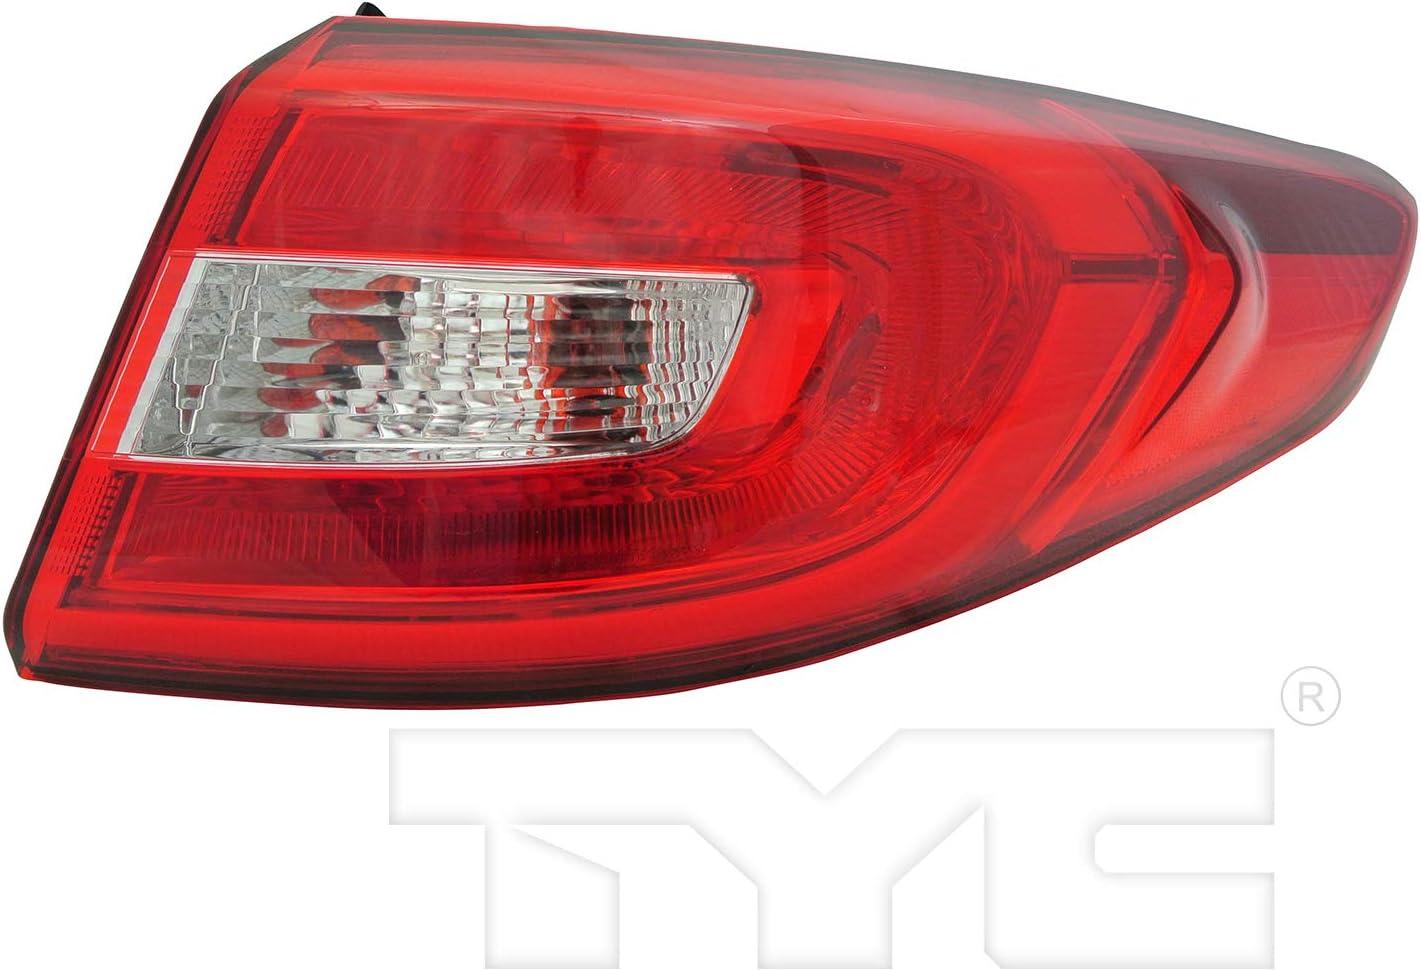 TYC 11-6721-00-9 Direct stock discount Hyundai Sonata 55% OFF Lamp Replacement Tail